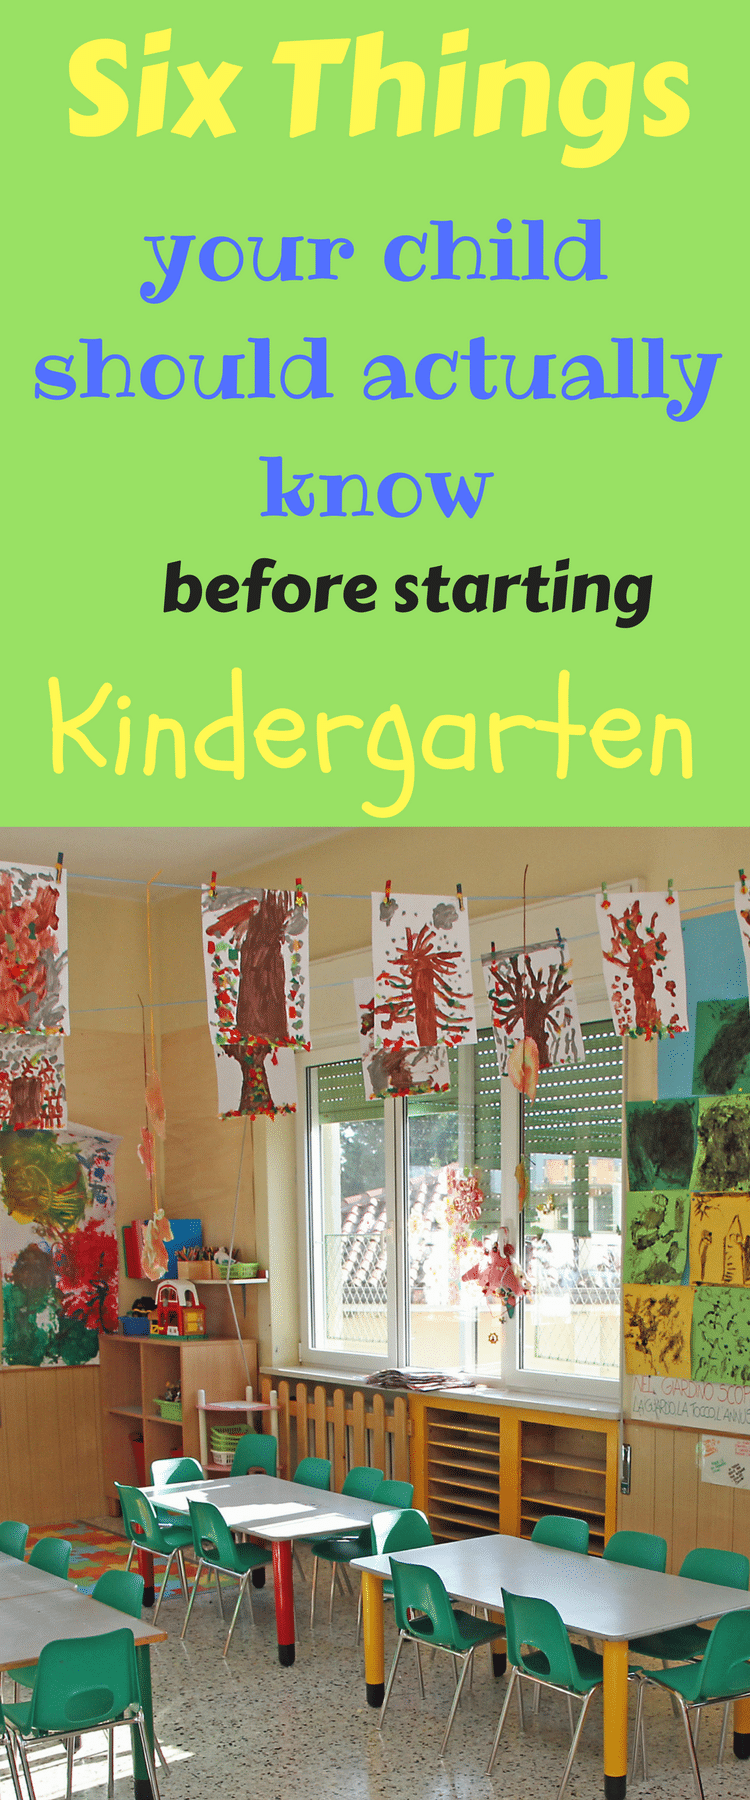 Kindergarten / Kindergarten Tips / Kindergarten prep / Kindness via @clarkscondensed